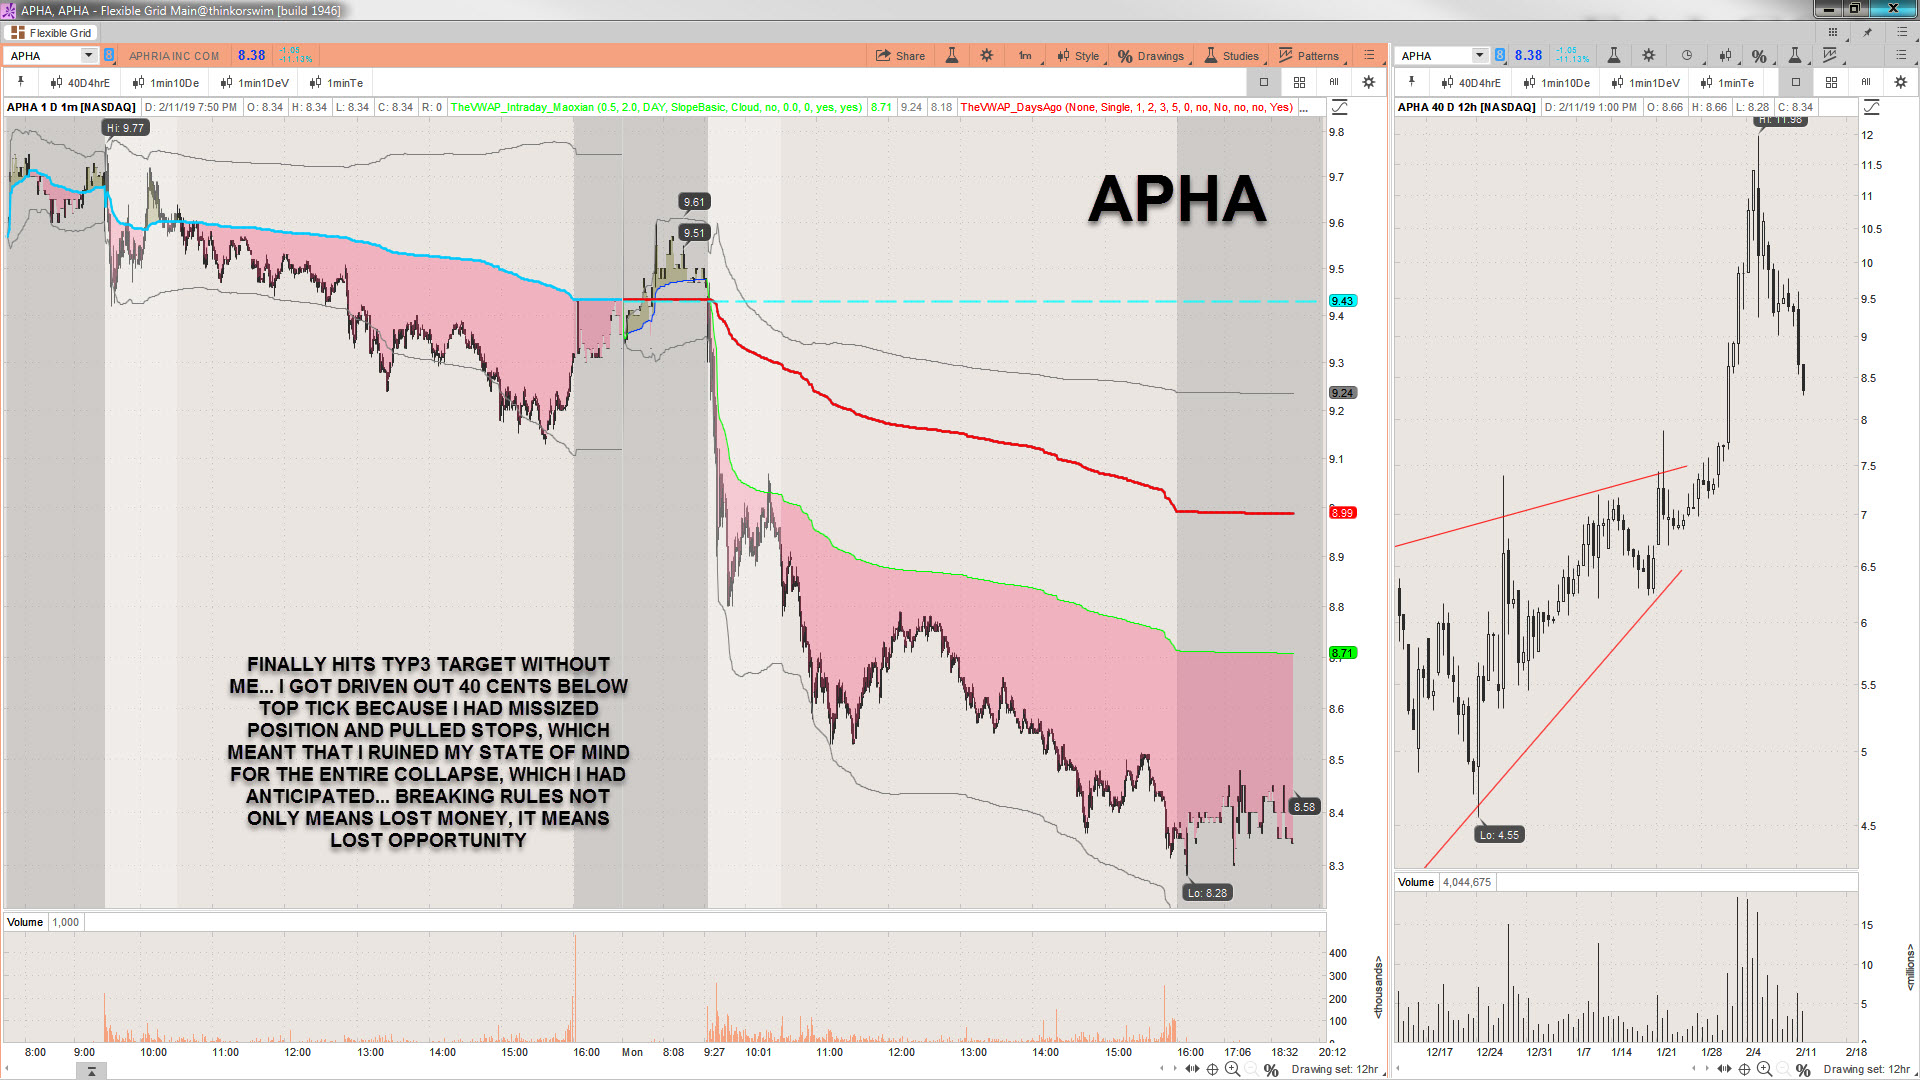 2019-02-11_20-08-27 APHA.jpg